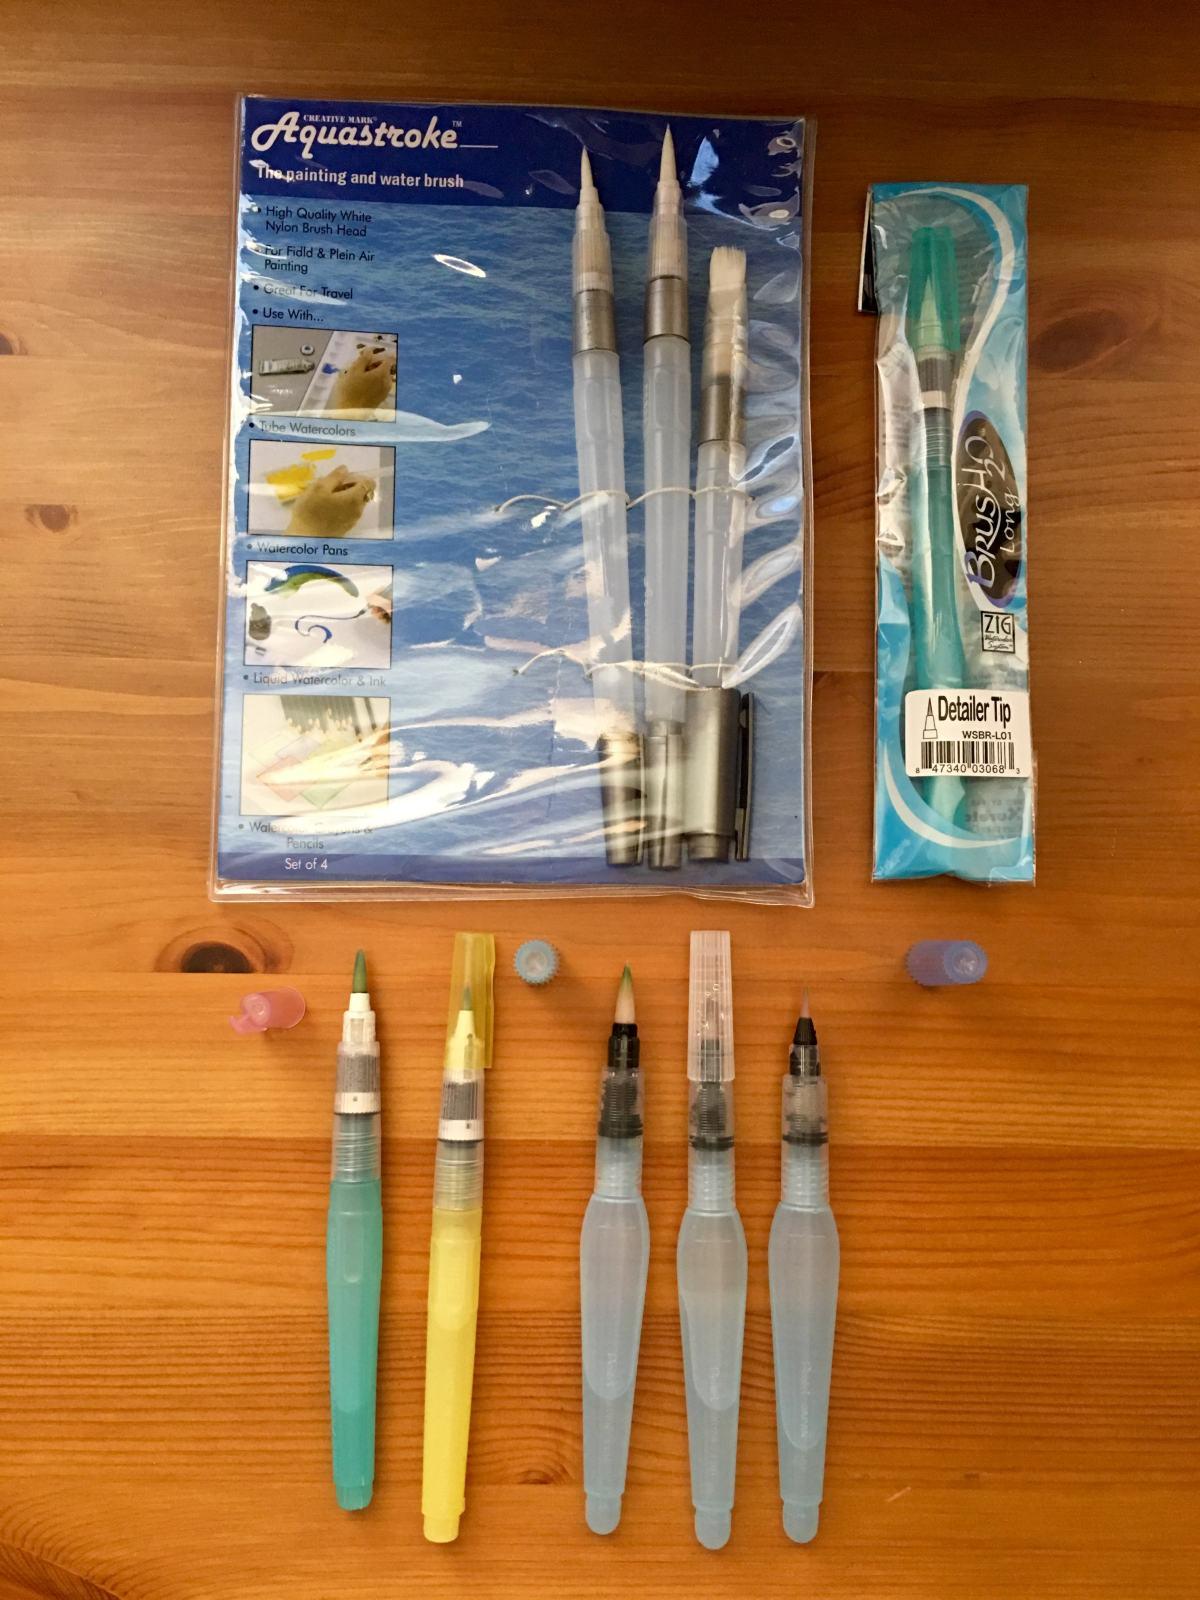 niji, pentel aquash and aquastroke waterbrushes